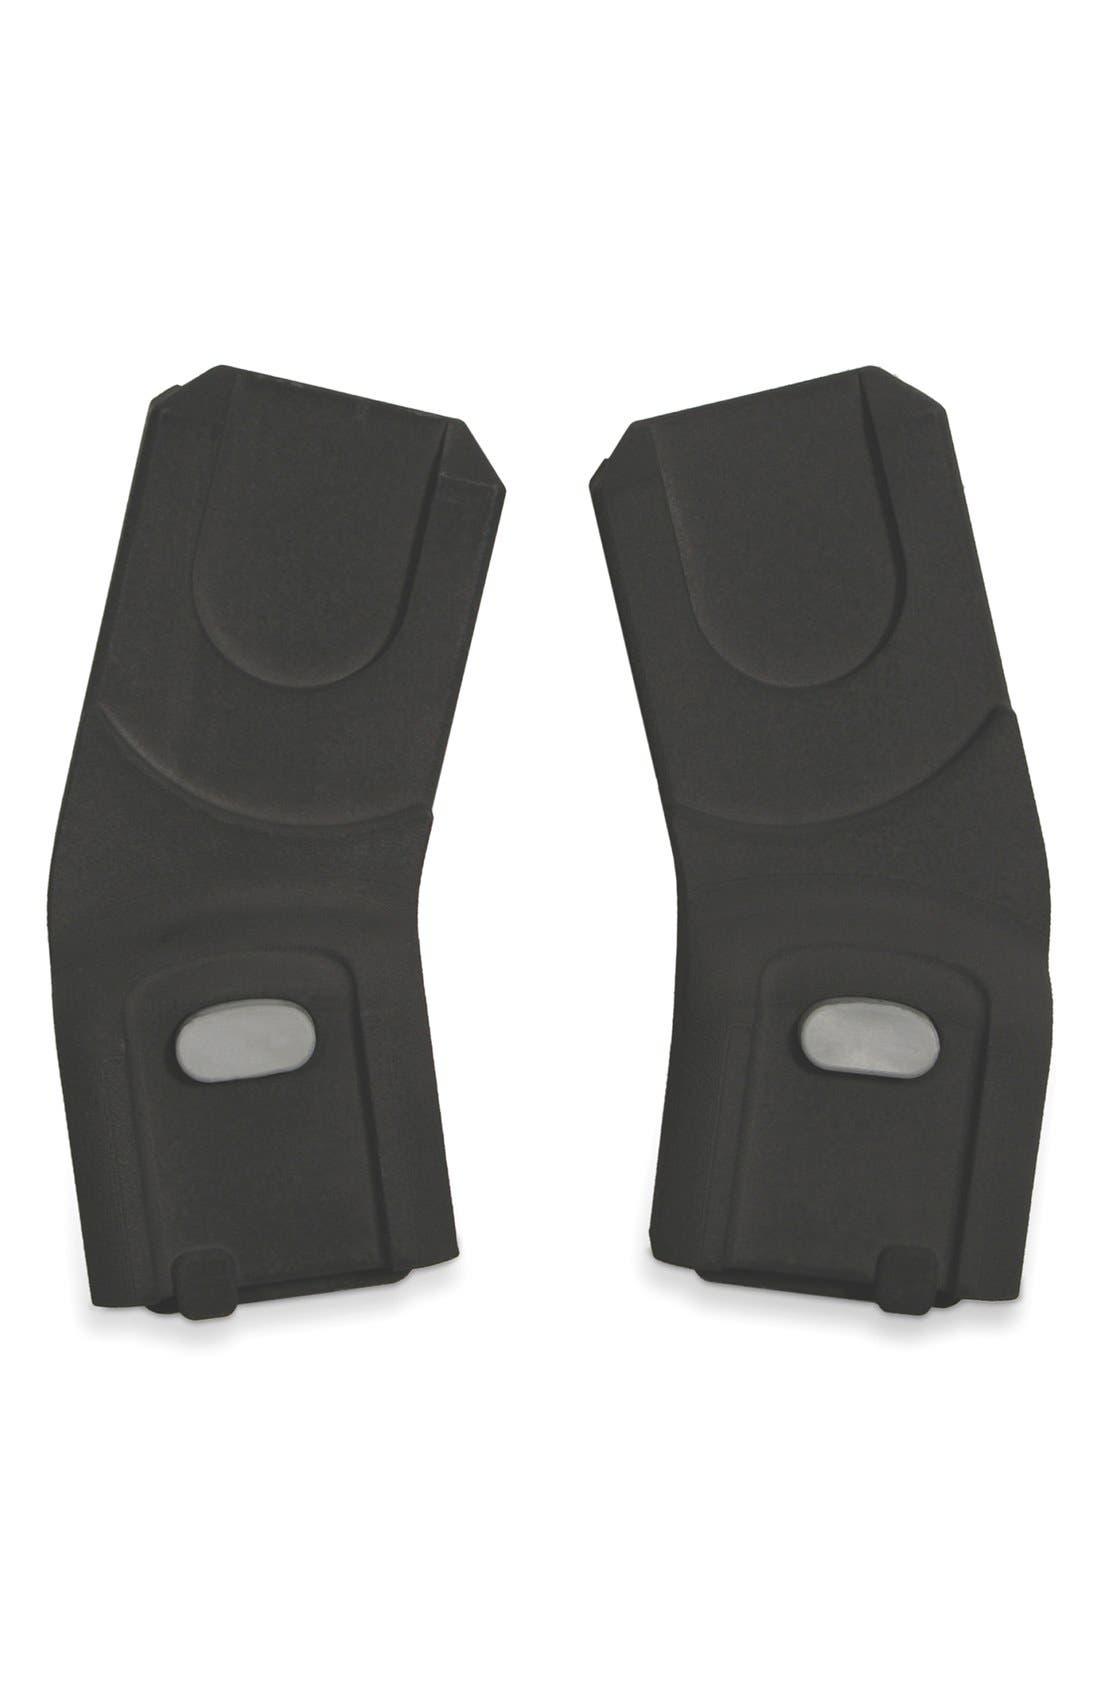 UPPAbaby VISTA & CRUZ  Maxi-Cosi® Infant Car Seat Adapter